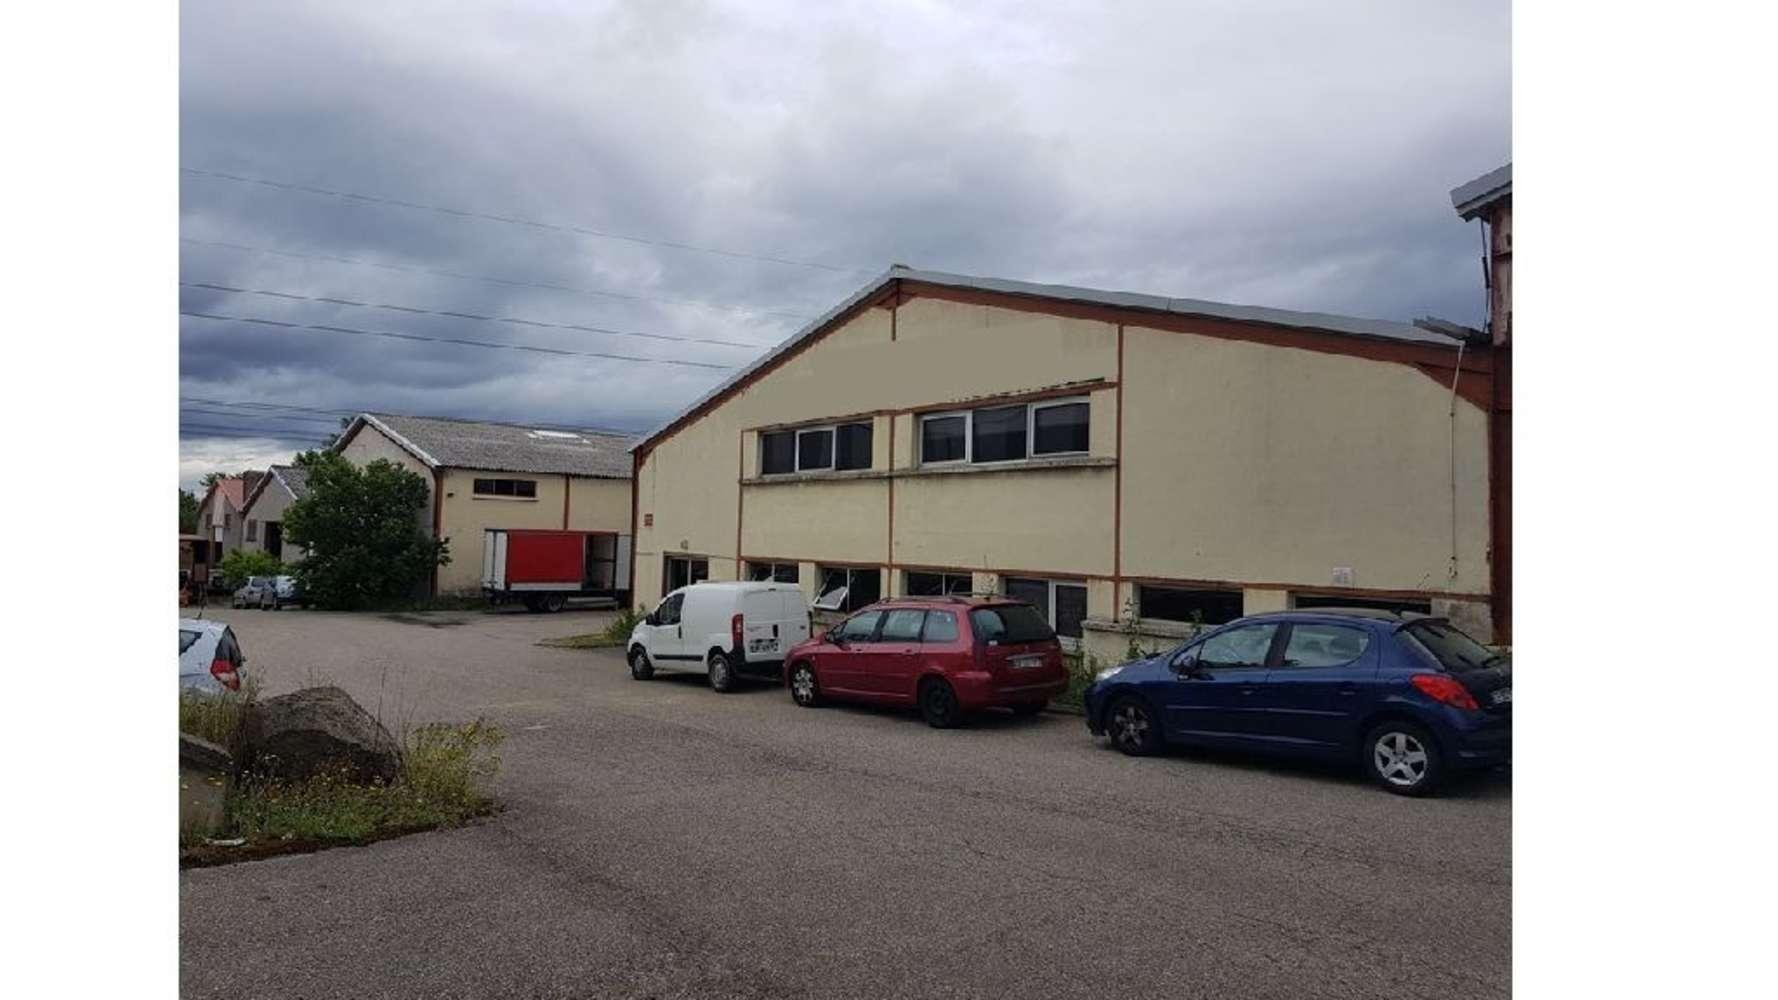 Activités/entrepôt Chassagny, 69700 - Vente entrepot Lyon / Chassagny (69) - 10067077